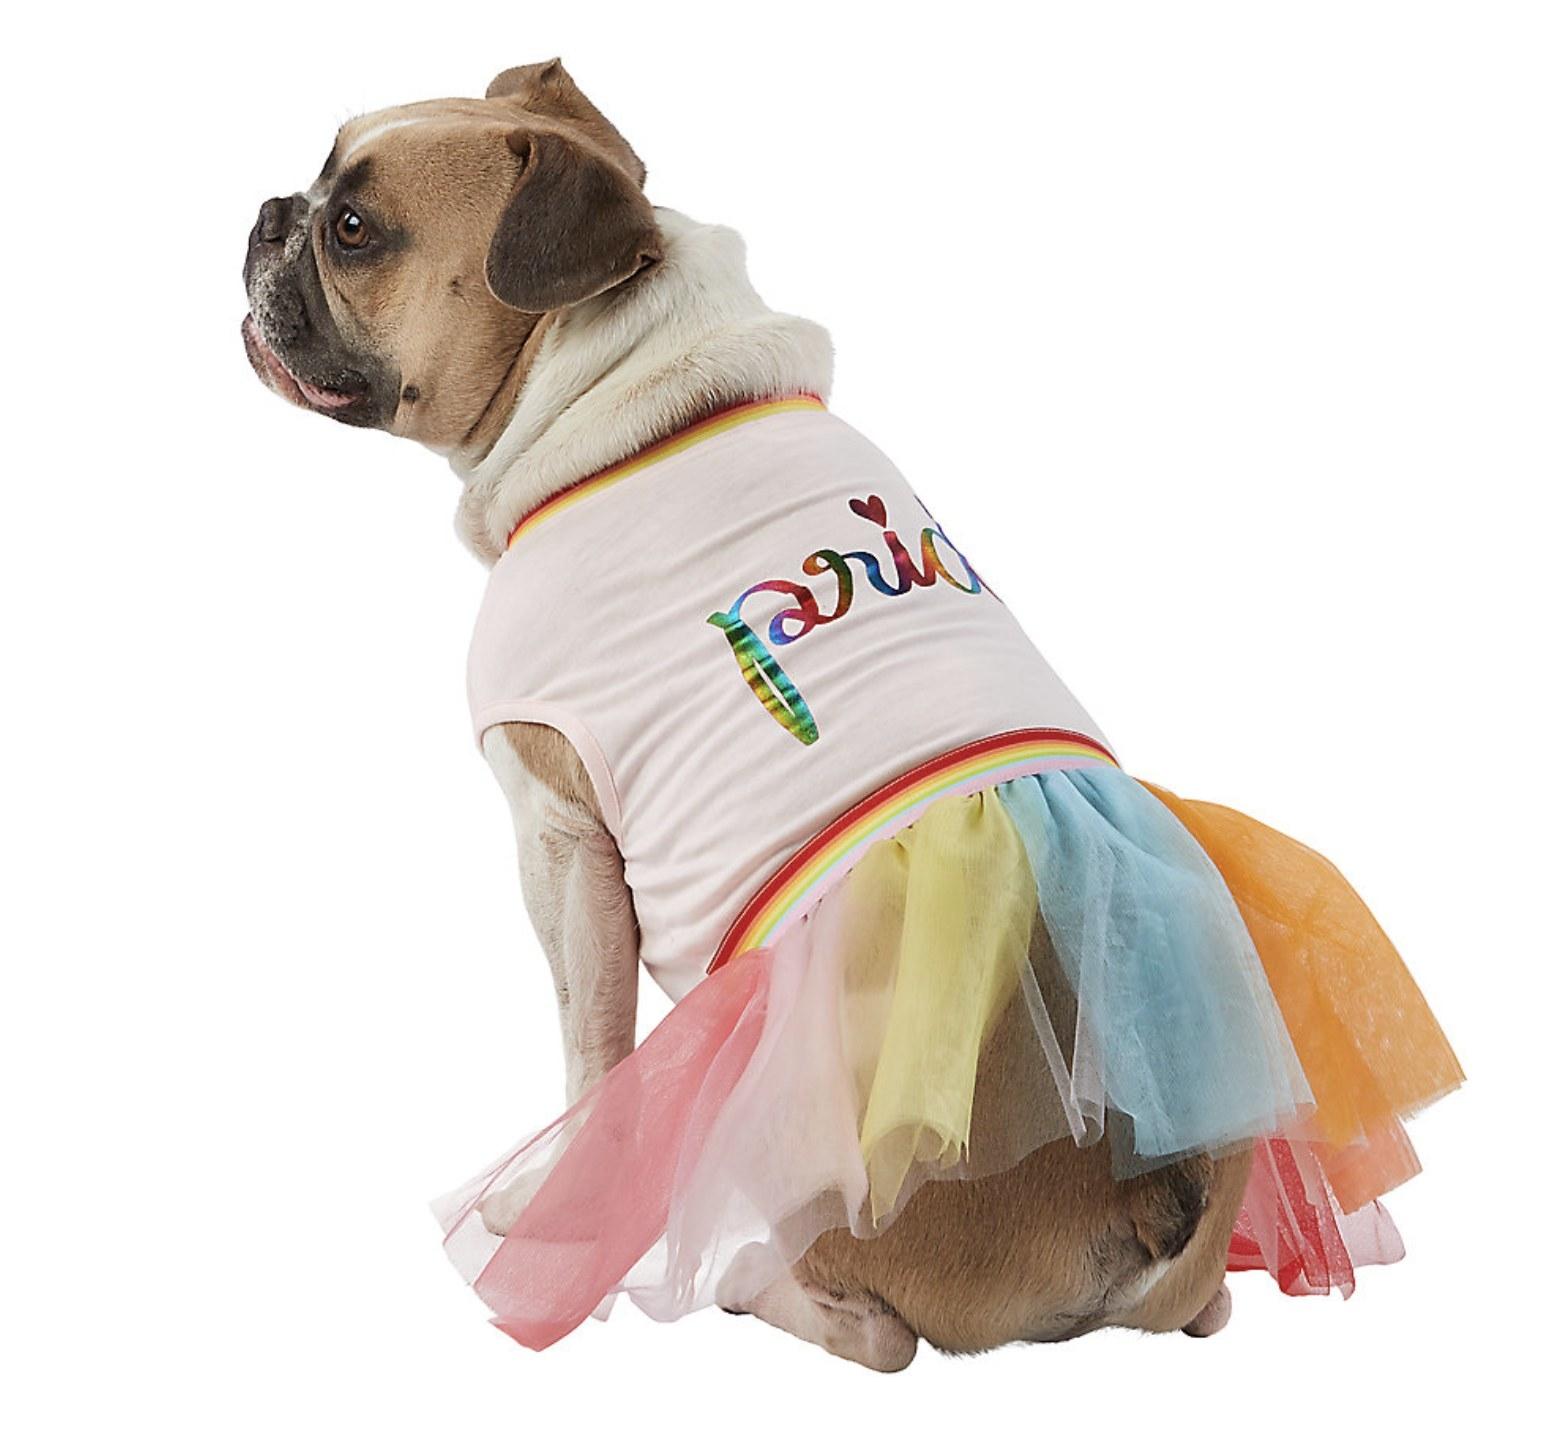 A dog wearing a pride dress